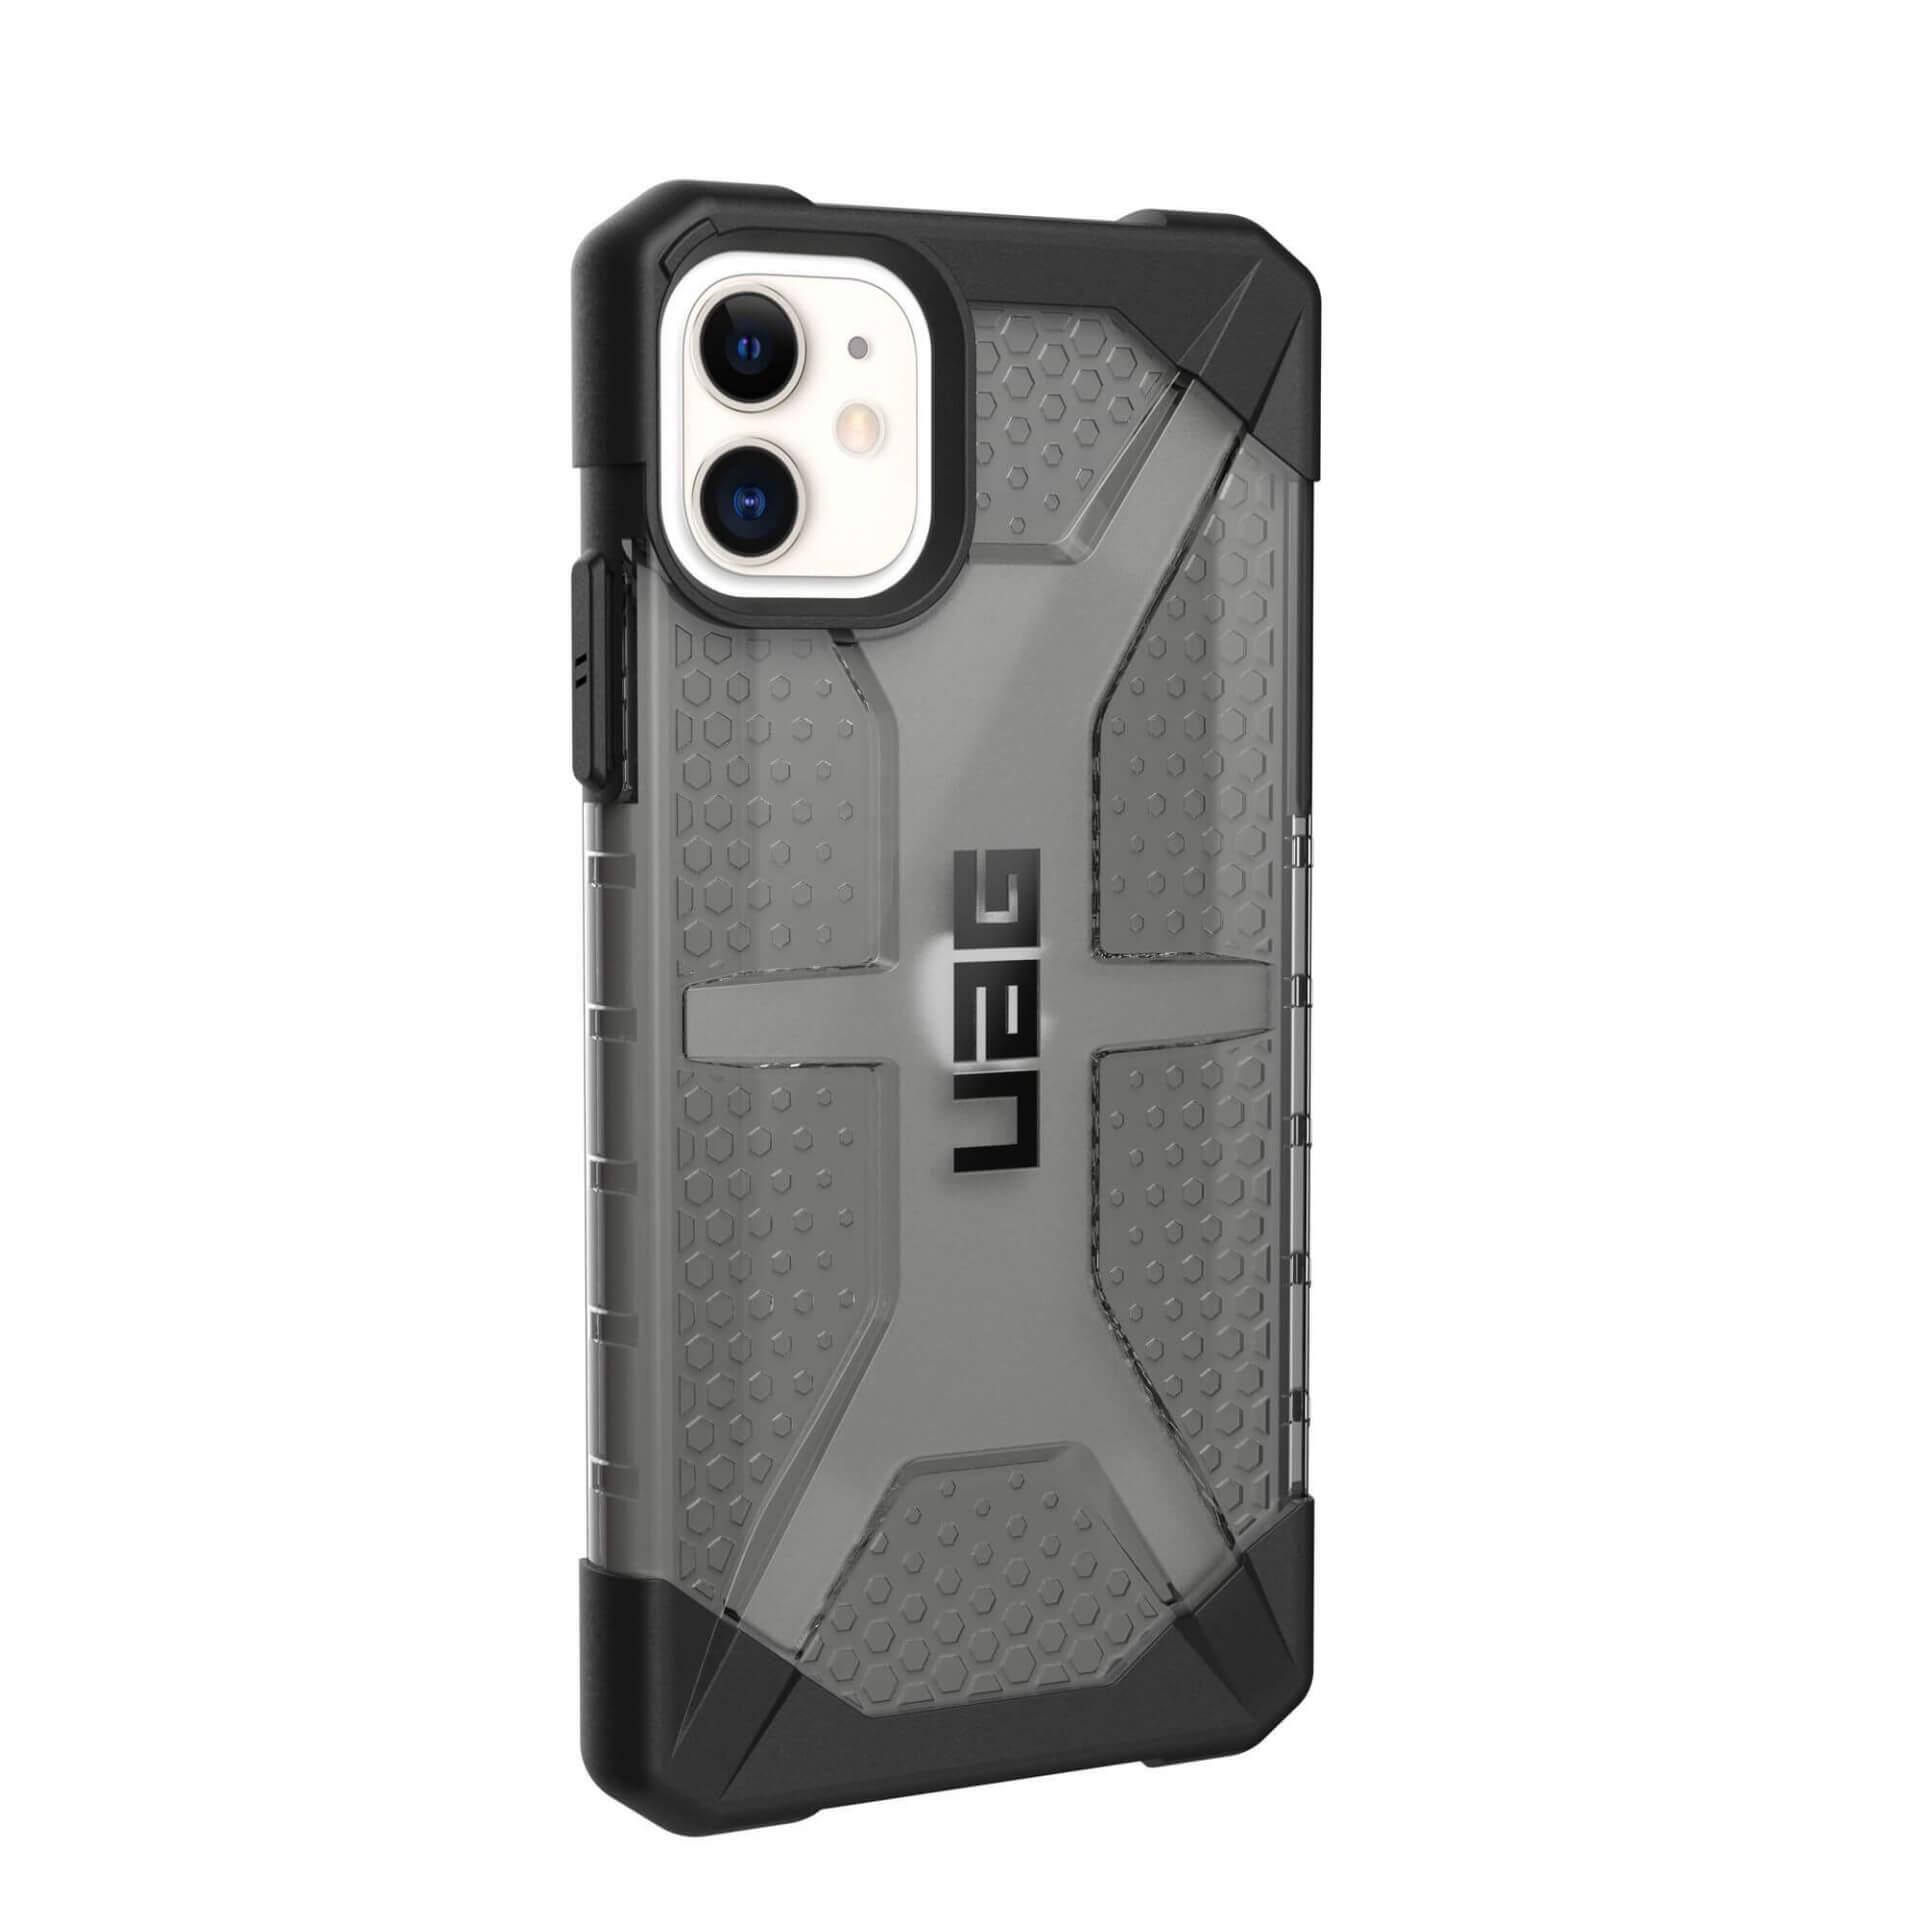 Urban Armor Gear Plasma — удароустойчив хибриден кейс за iPhone 11 (черен-прозрачен) - 3